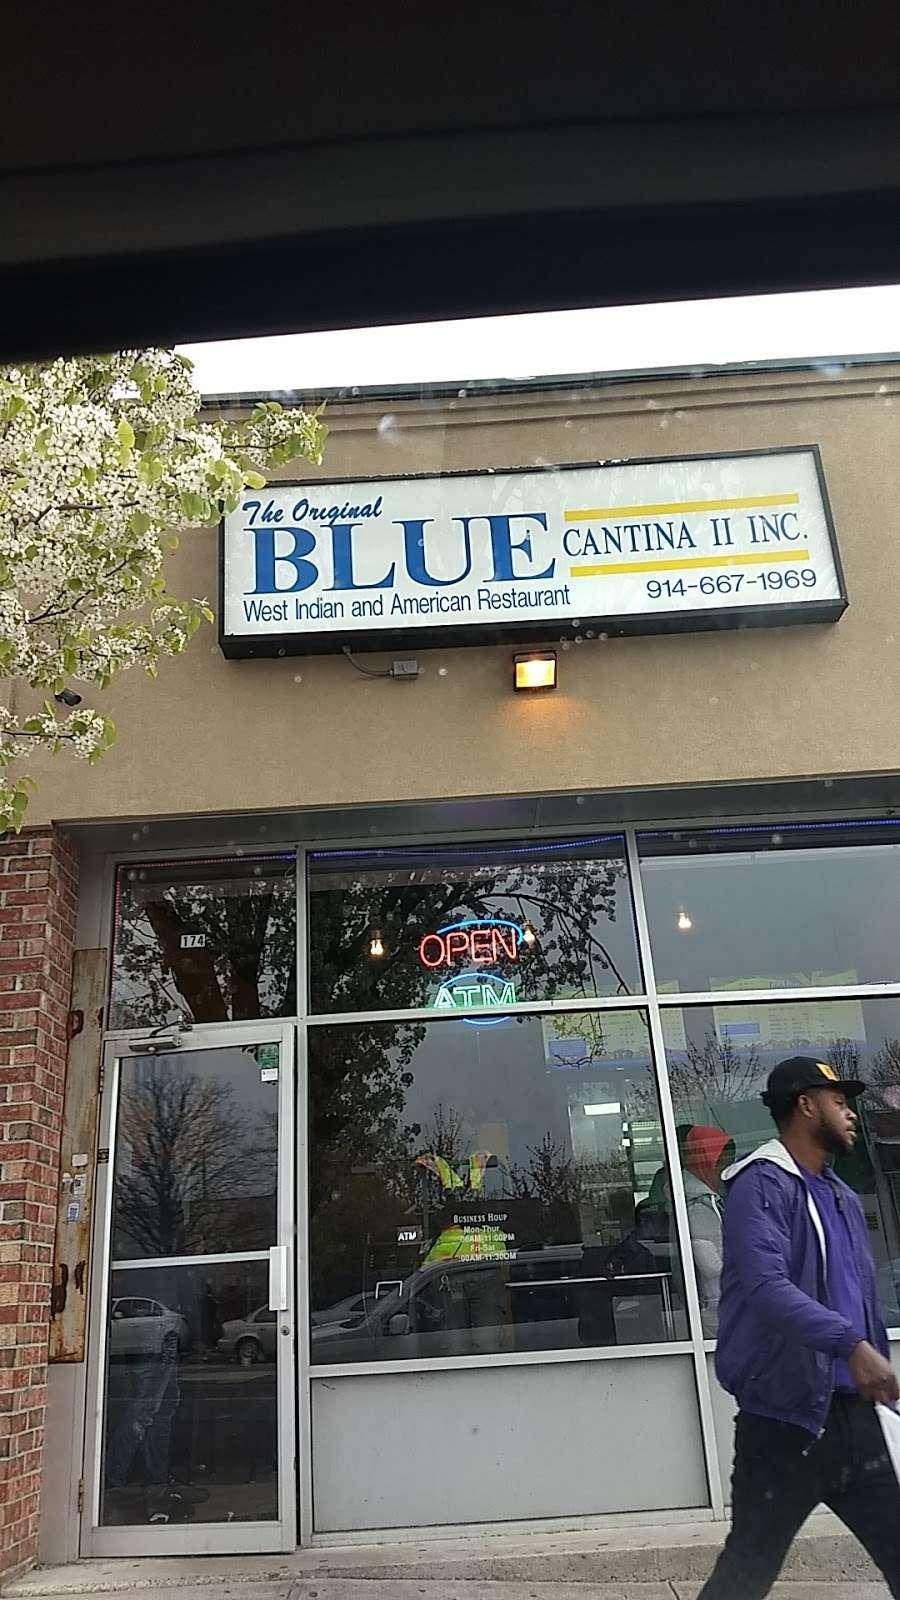 Blue Cantina - restaurant  | Photo 2 of 8 | Address: Mt Vernon, NY 10550, USA | Phone: (914) 667-1969